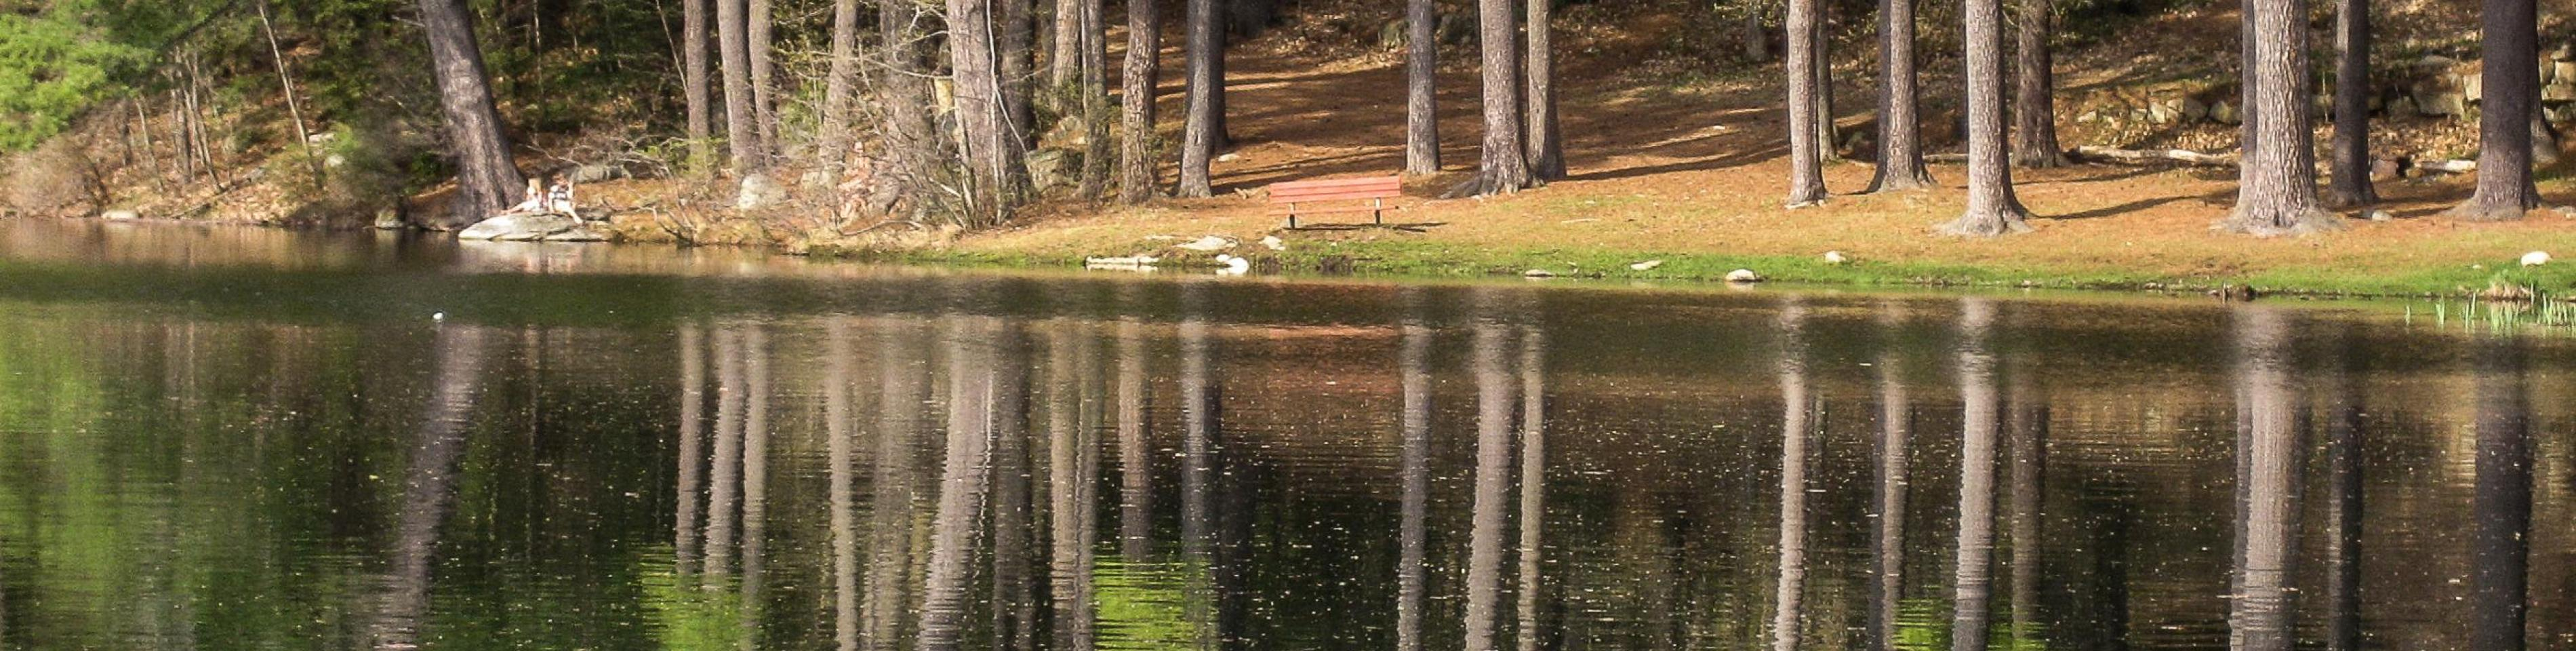 Robin Hood Pond